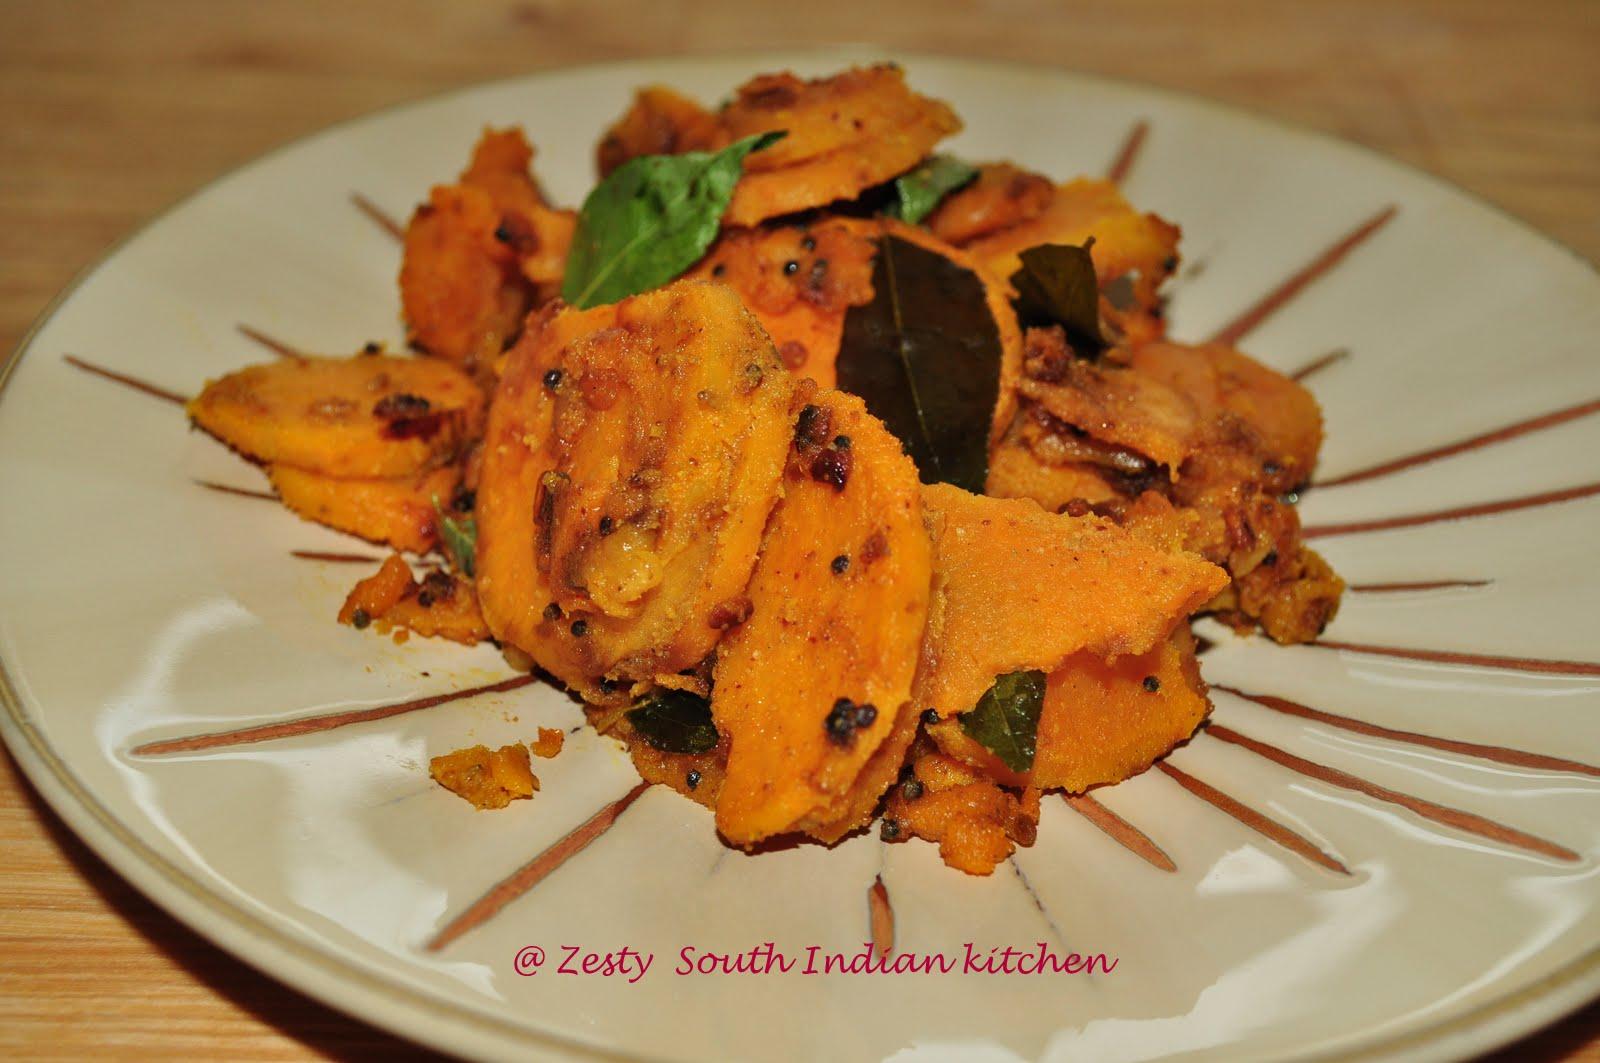 Sweet Potato Stir Fry Zesty South Indian Kitchen